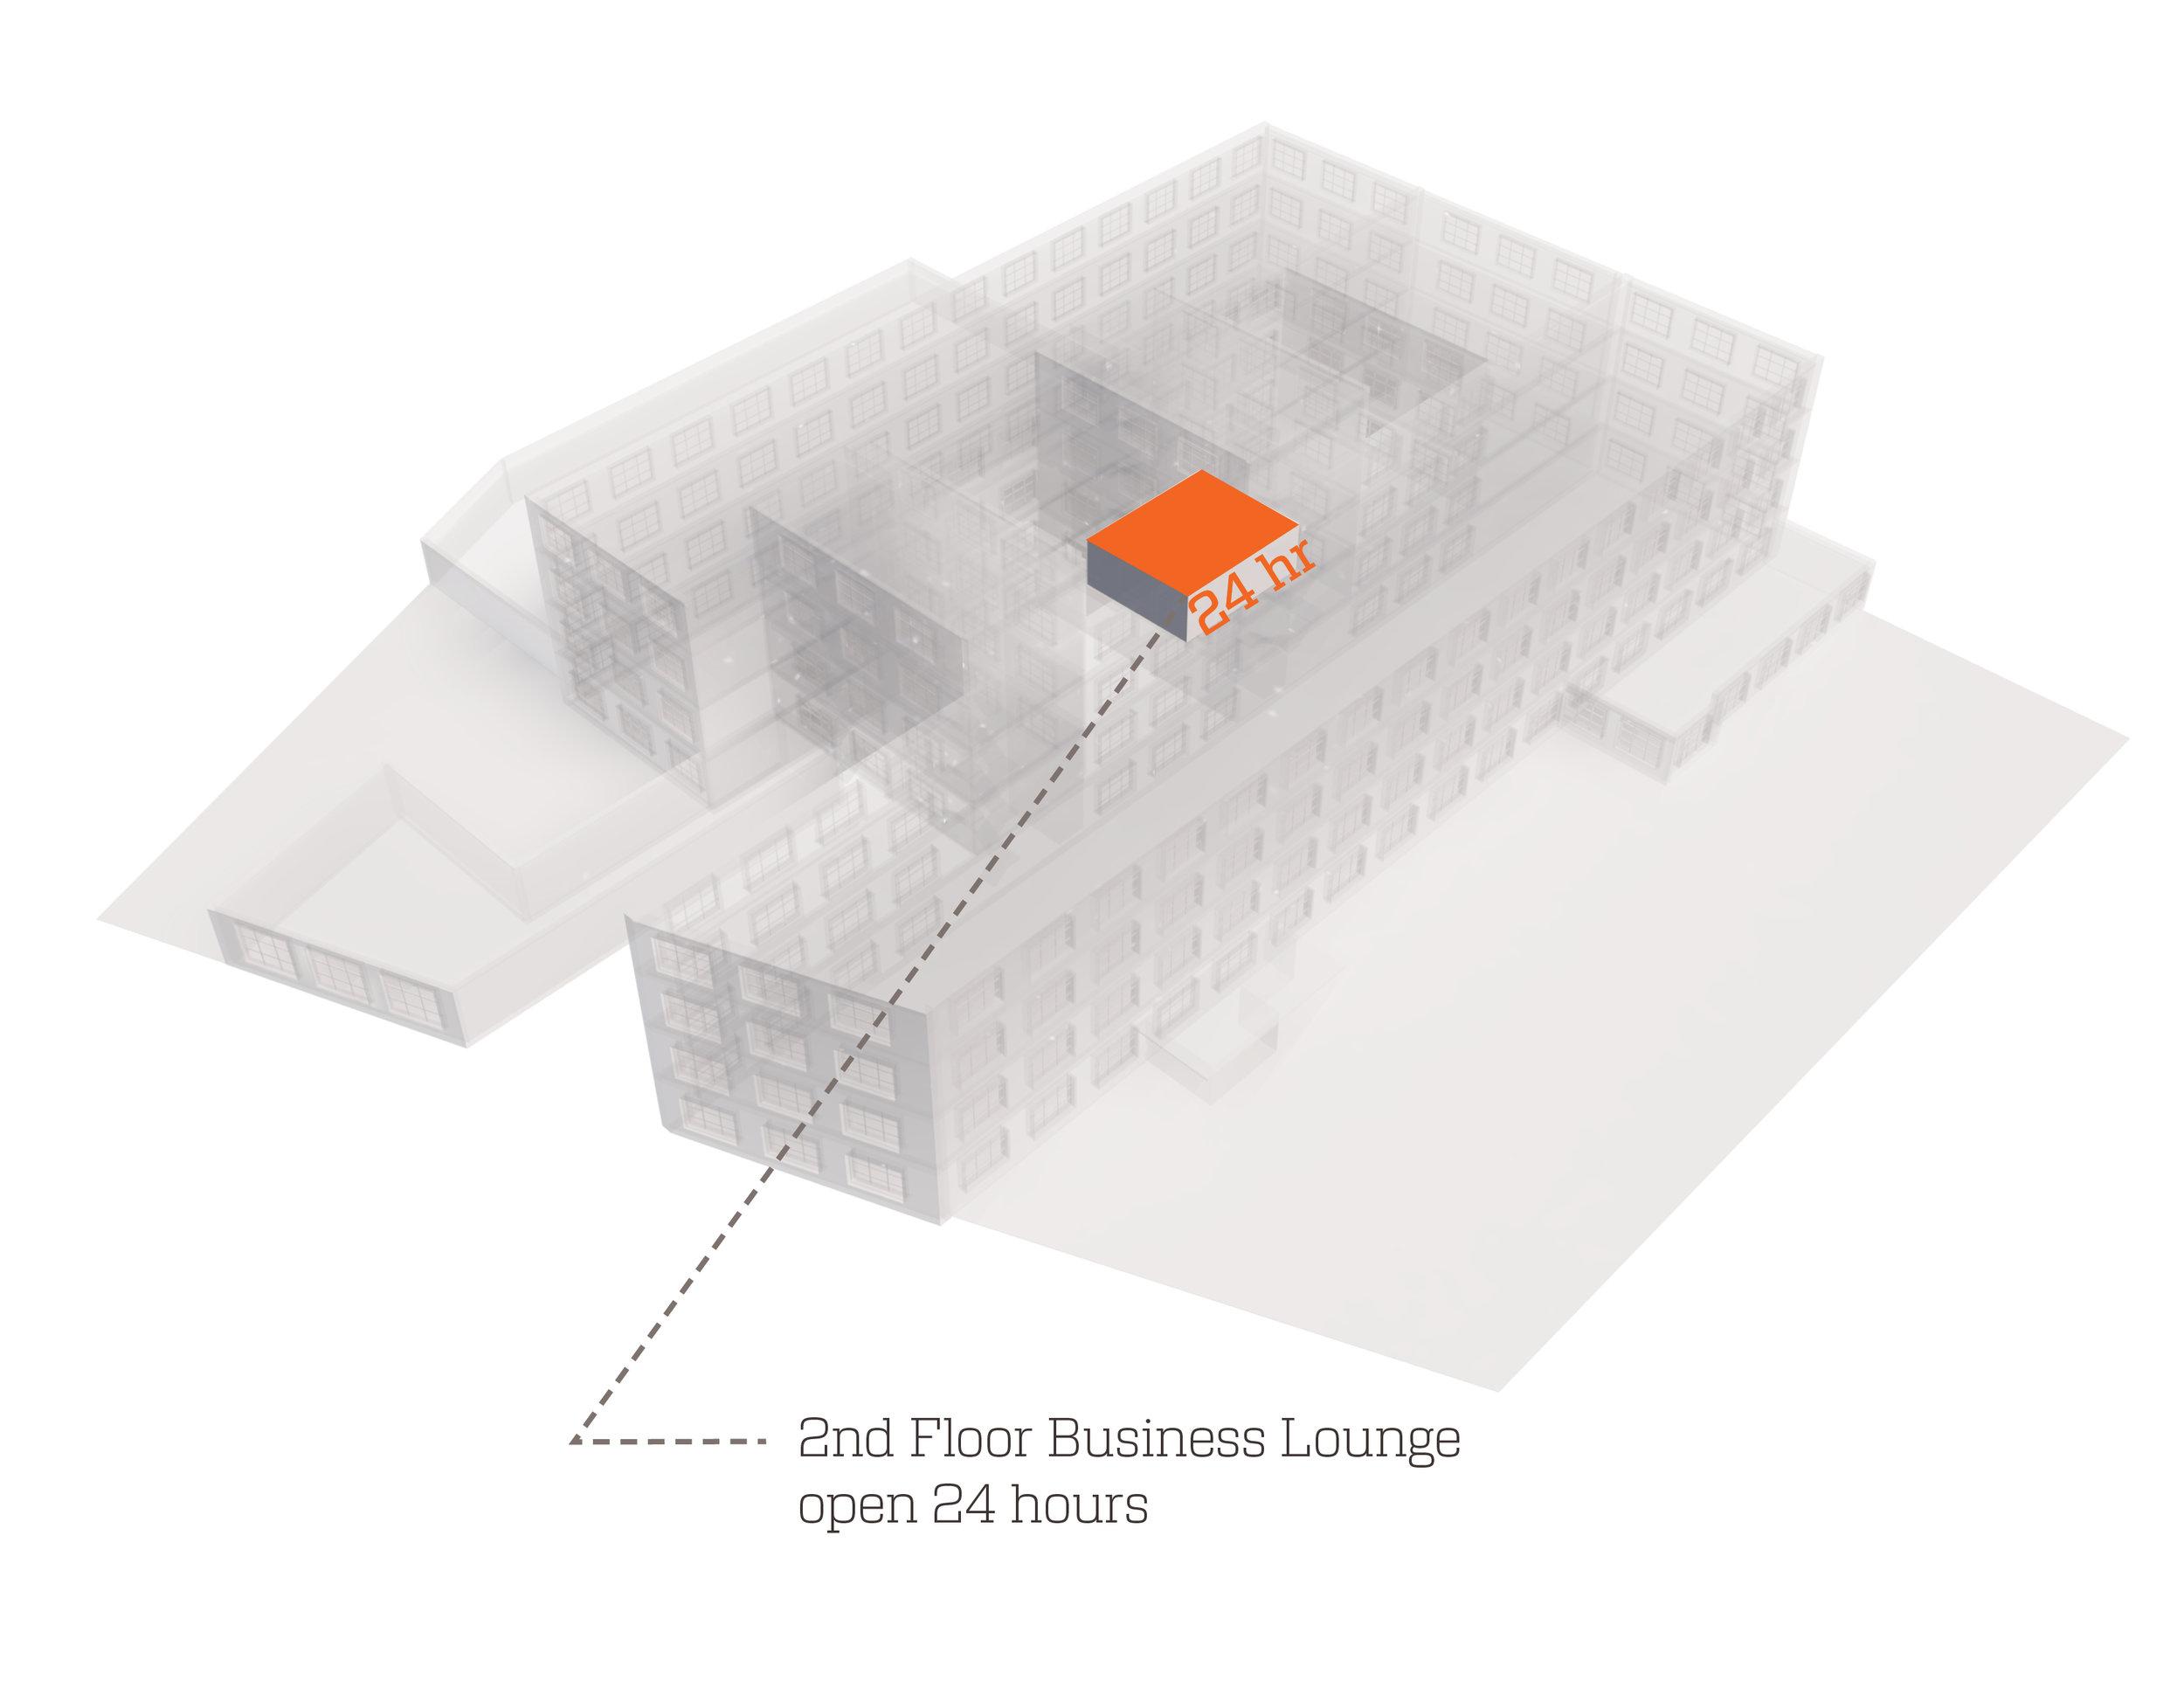 amenities diagrams8.jpg